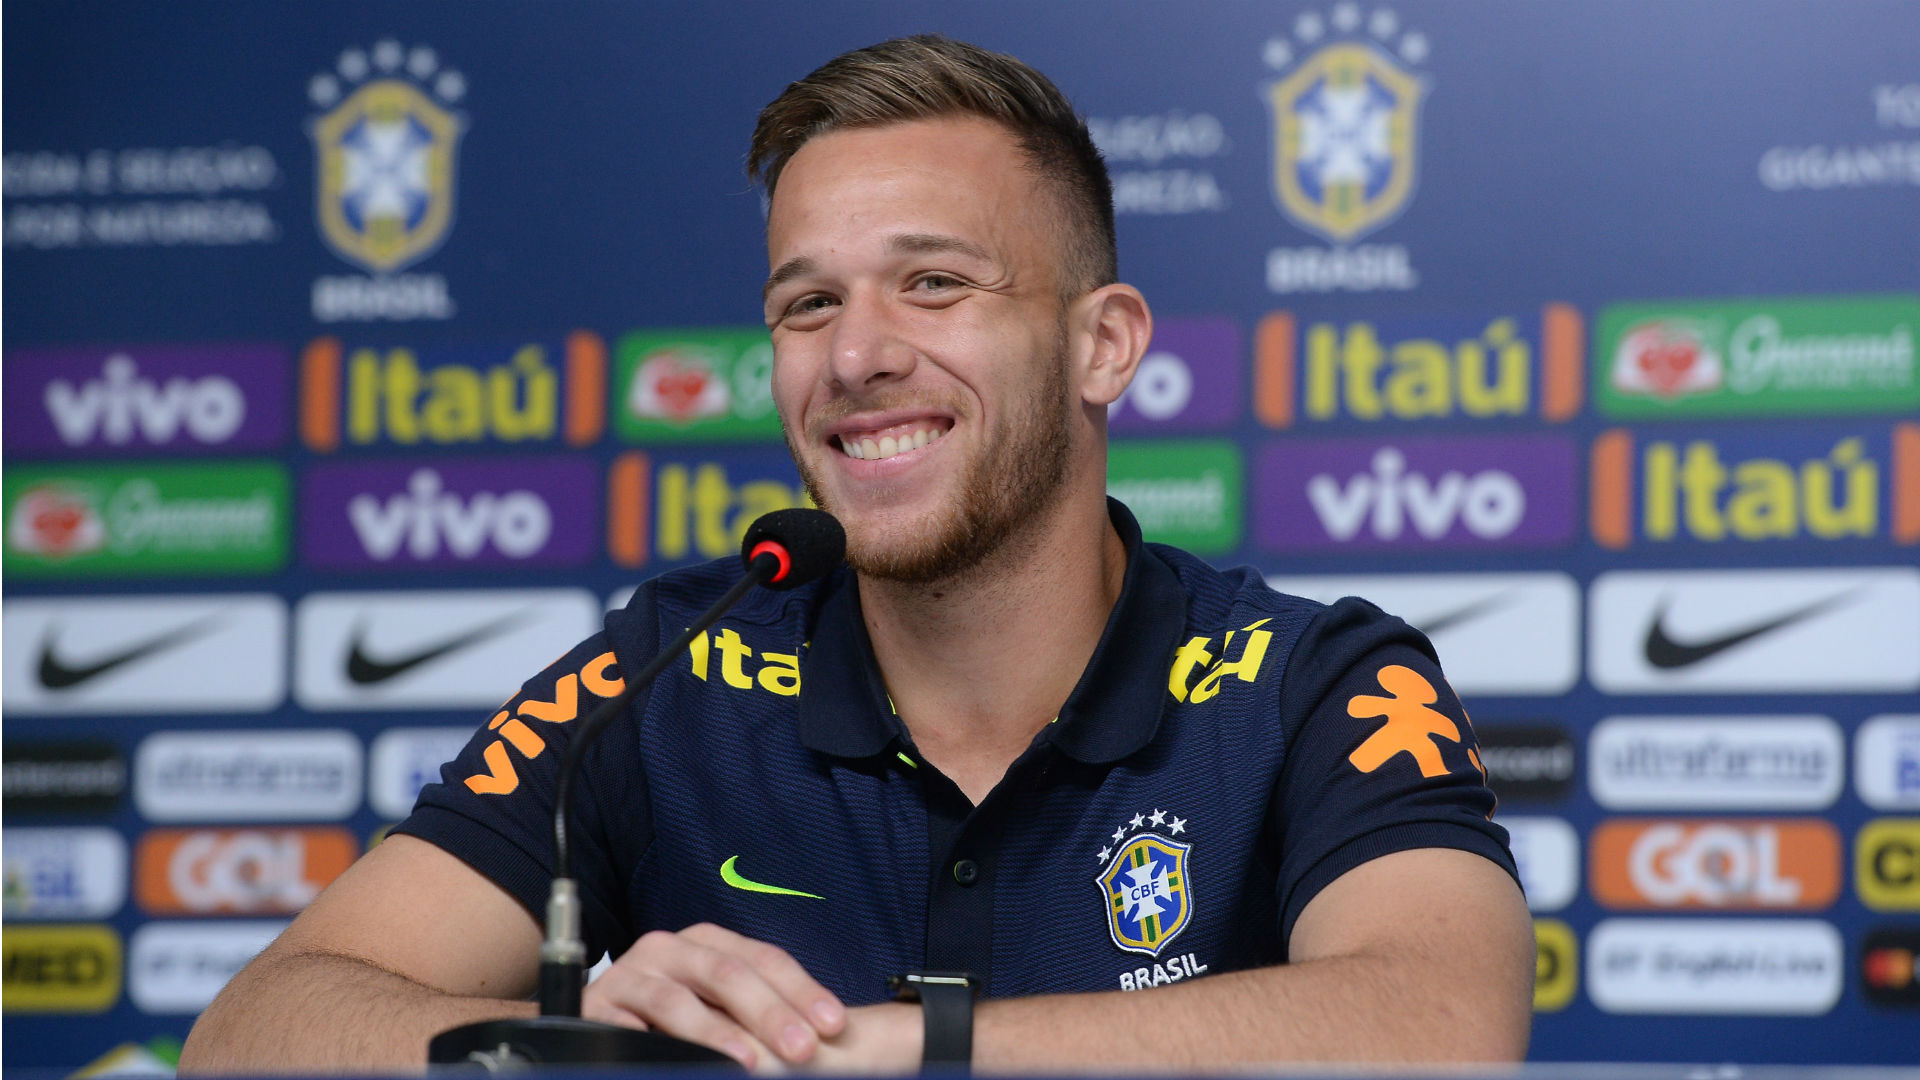 Arthur Seleção Brasil 02 10 2017